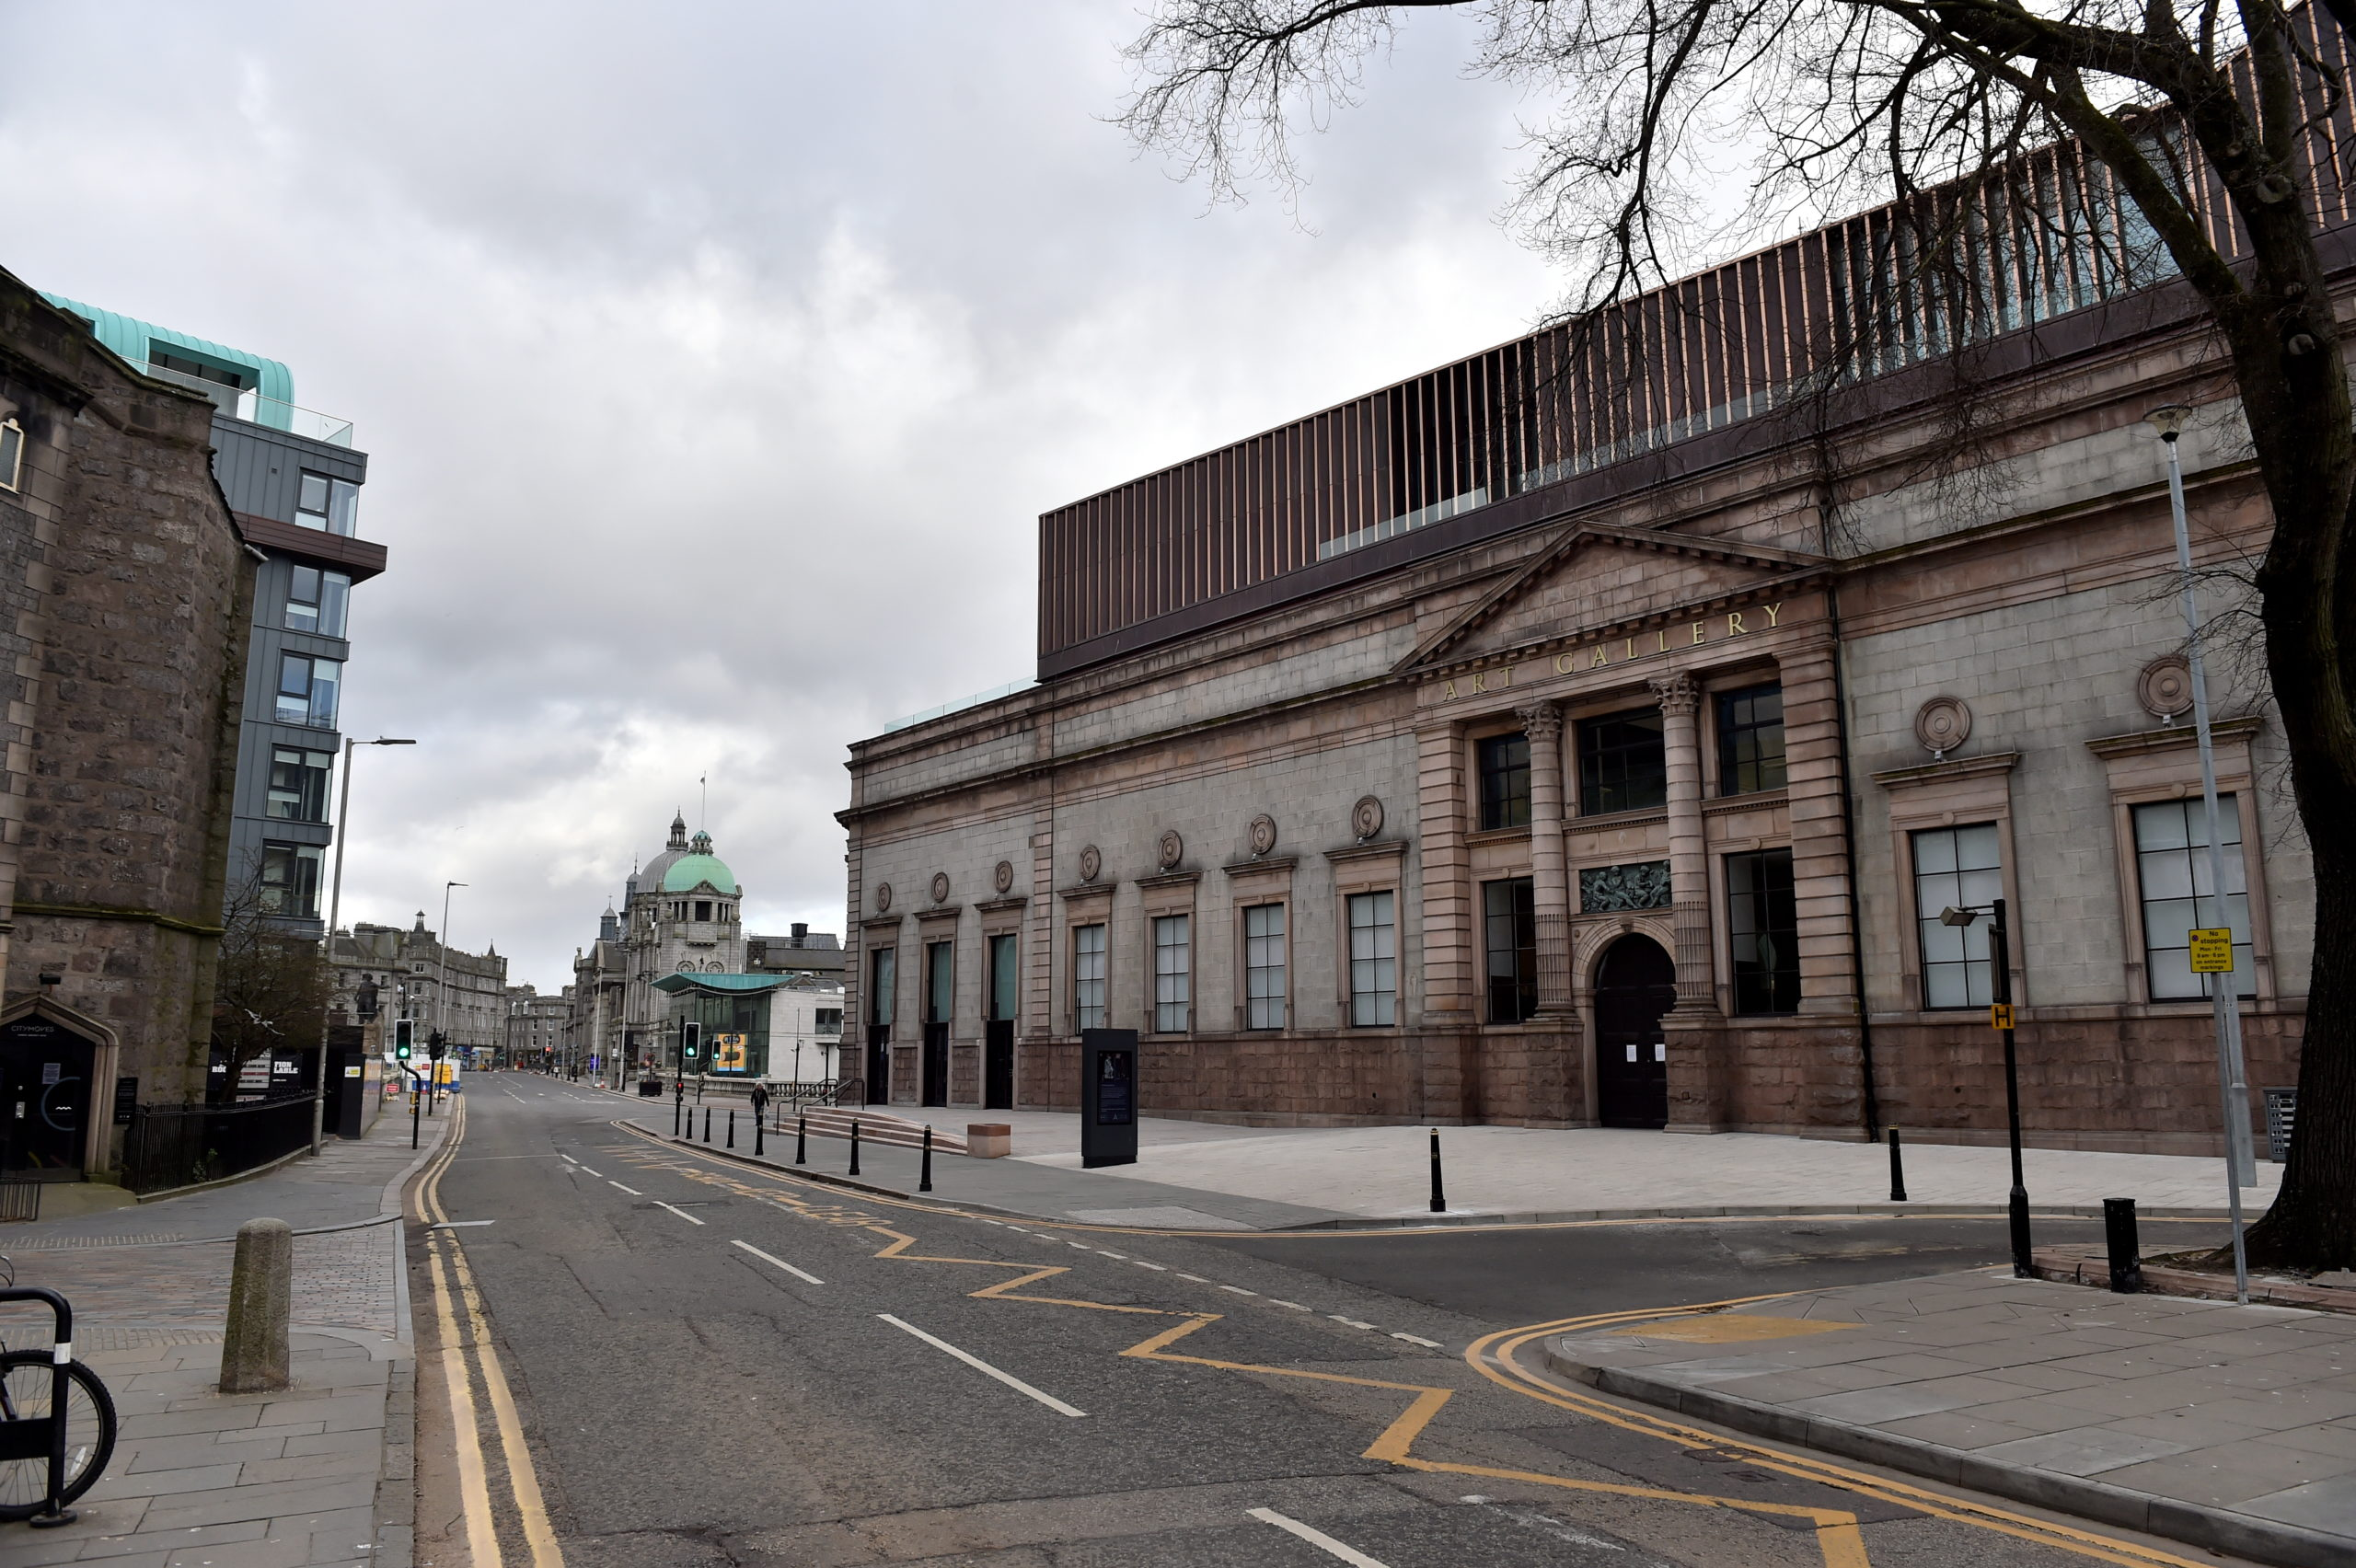 Aberdeen Art Gallery will host a prestigious event next year